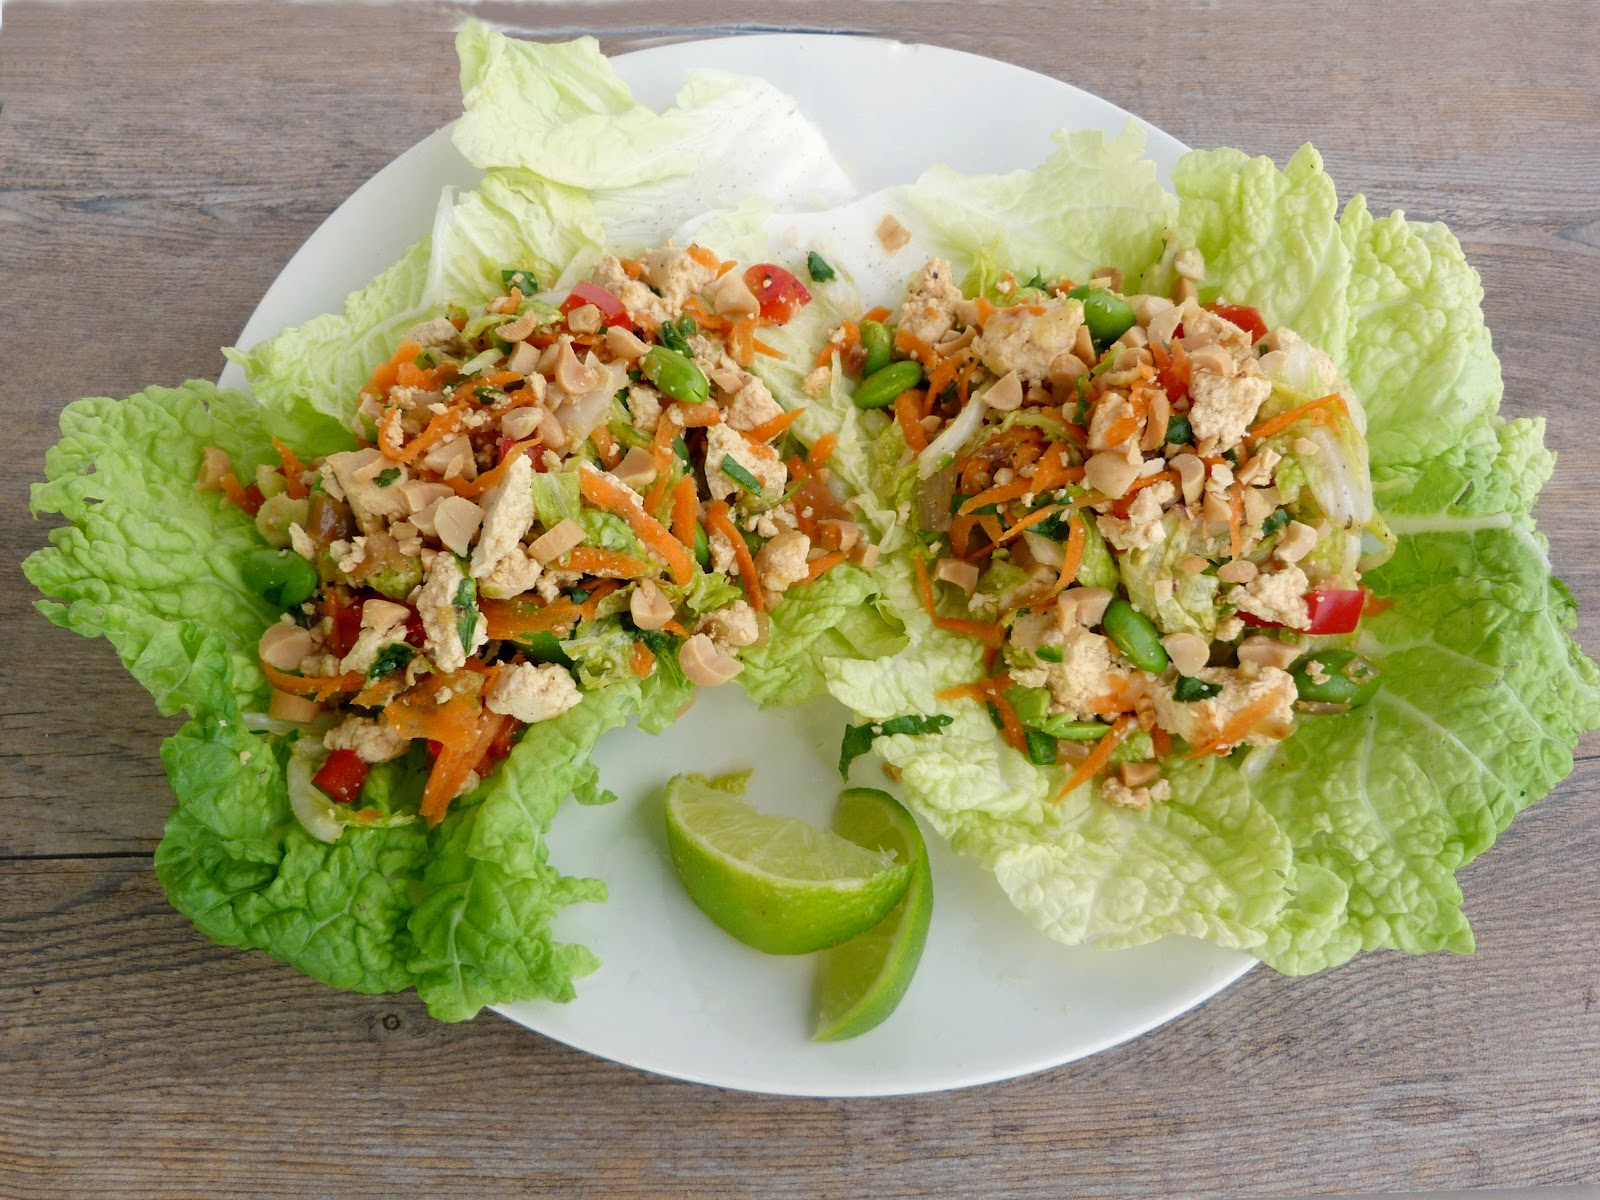 Vanilla & Spice: Laotian Tofu Larb Lettuce Wraps